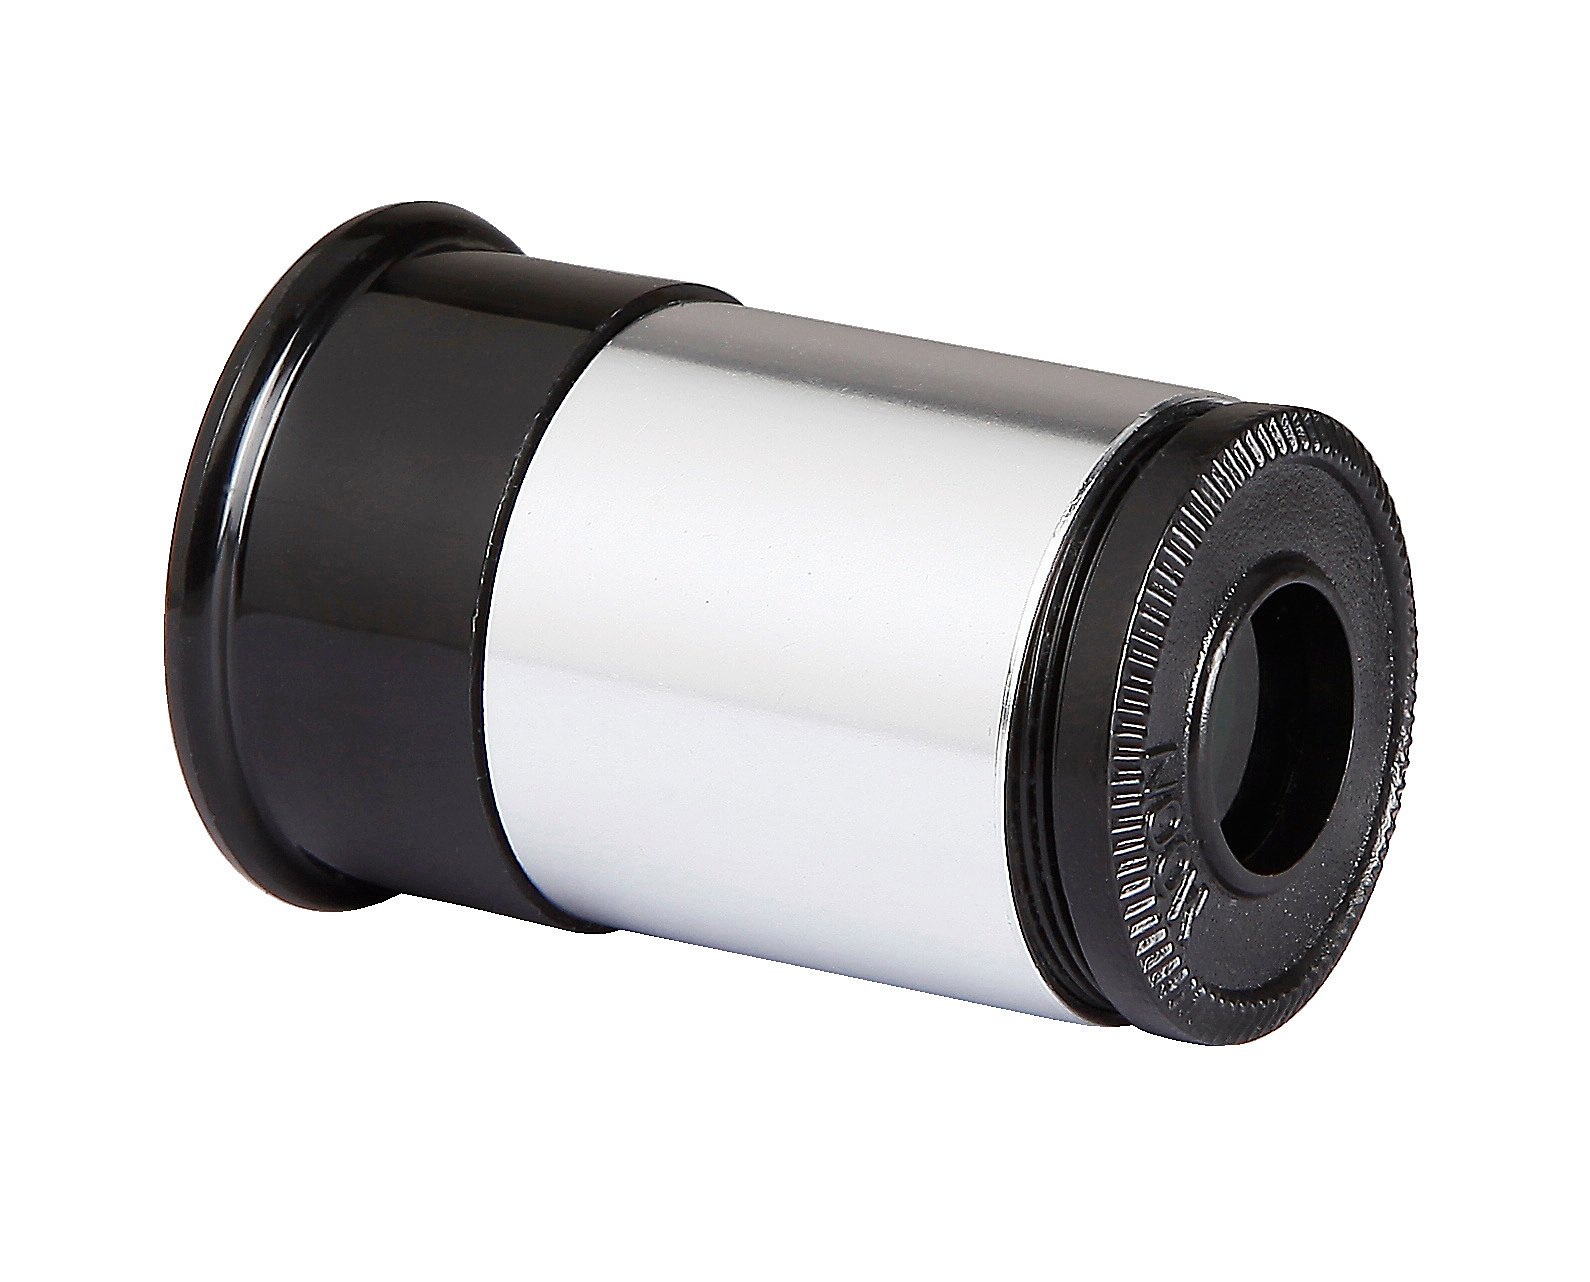 bresser lunar 60 700, refraktor-teleskop, mit stativ | weltbild.de